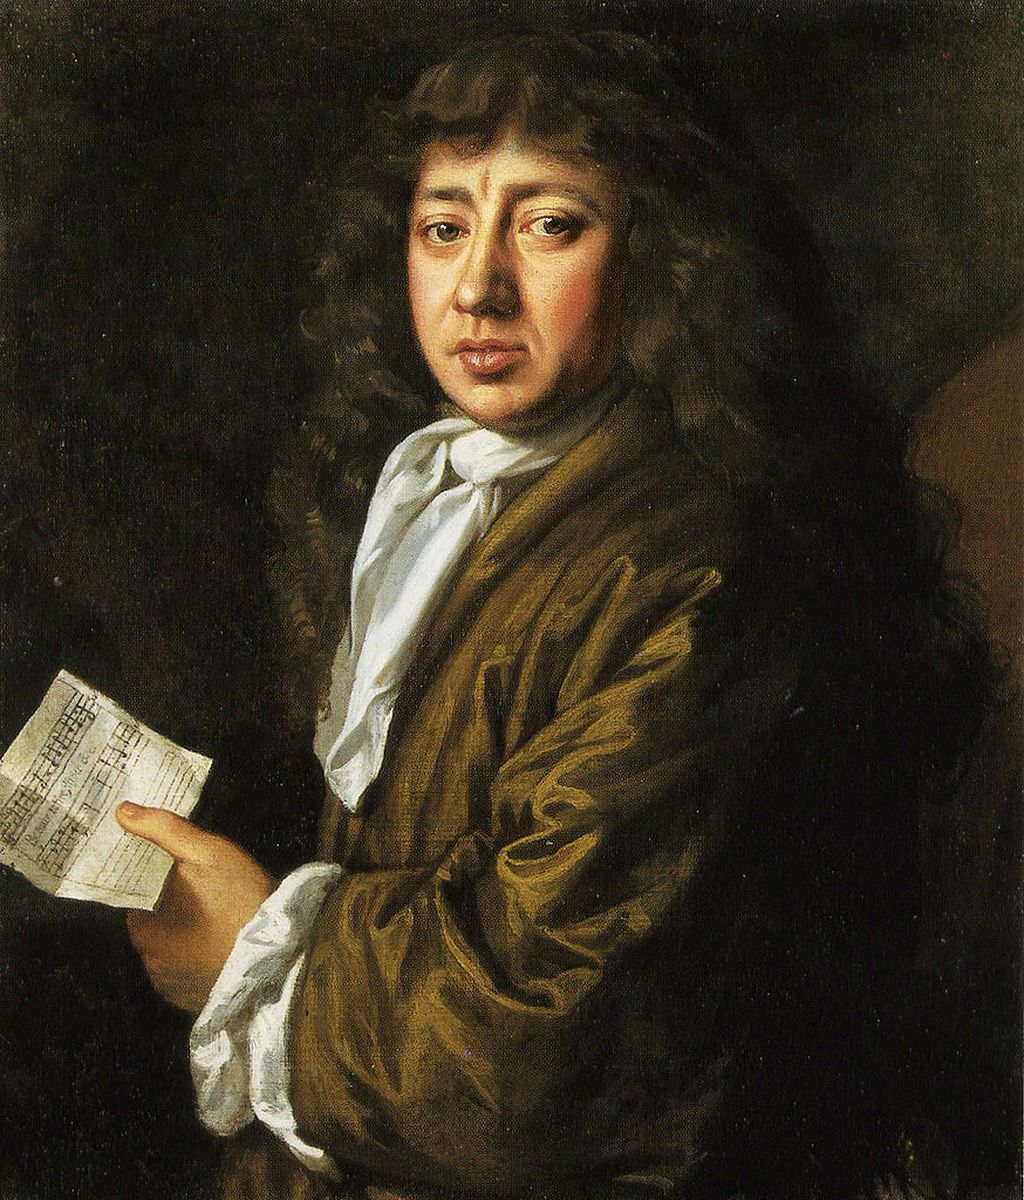 Painting of Samuel Pepys by John Hayls